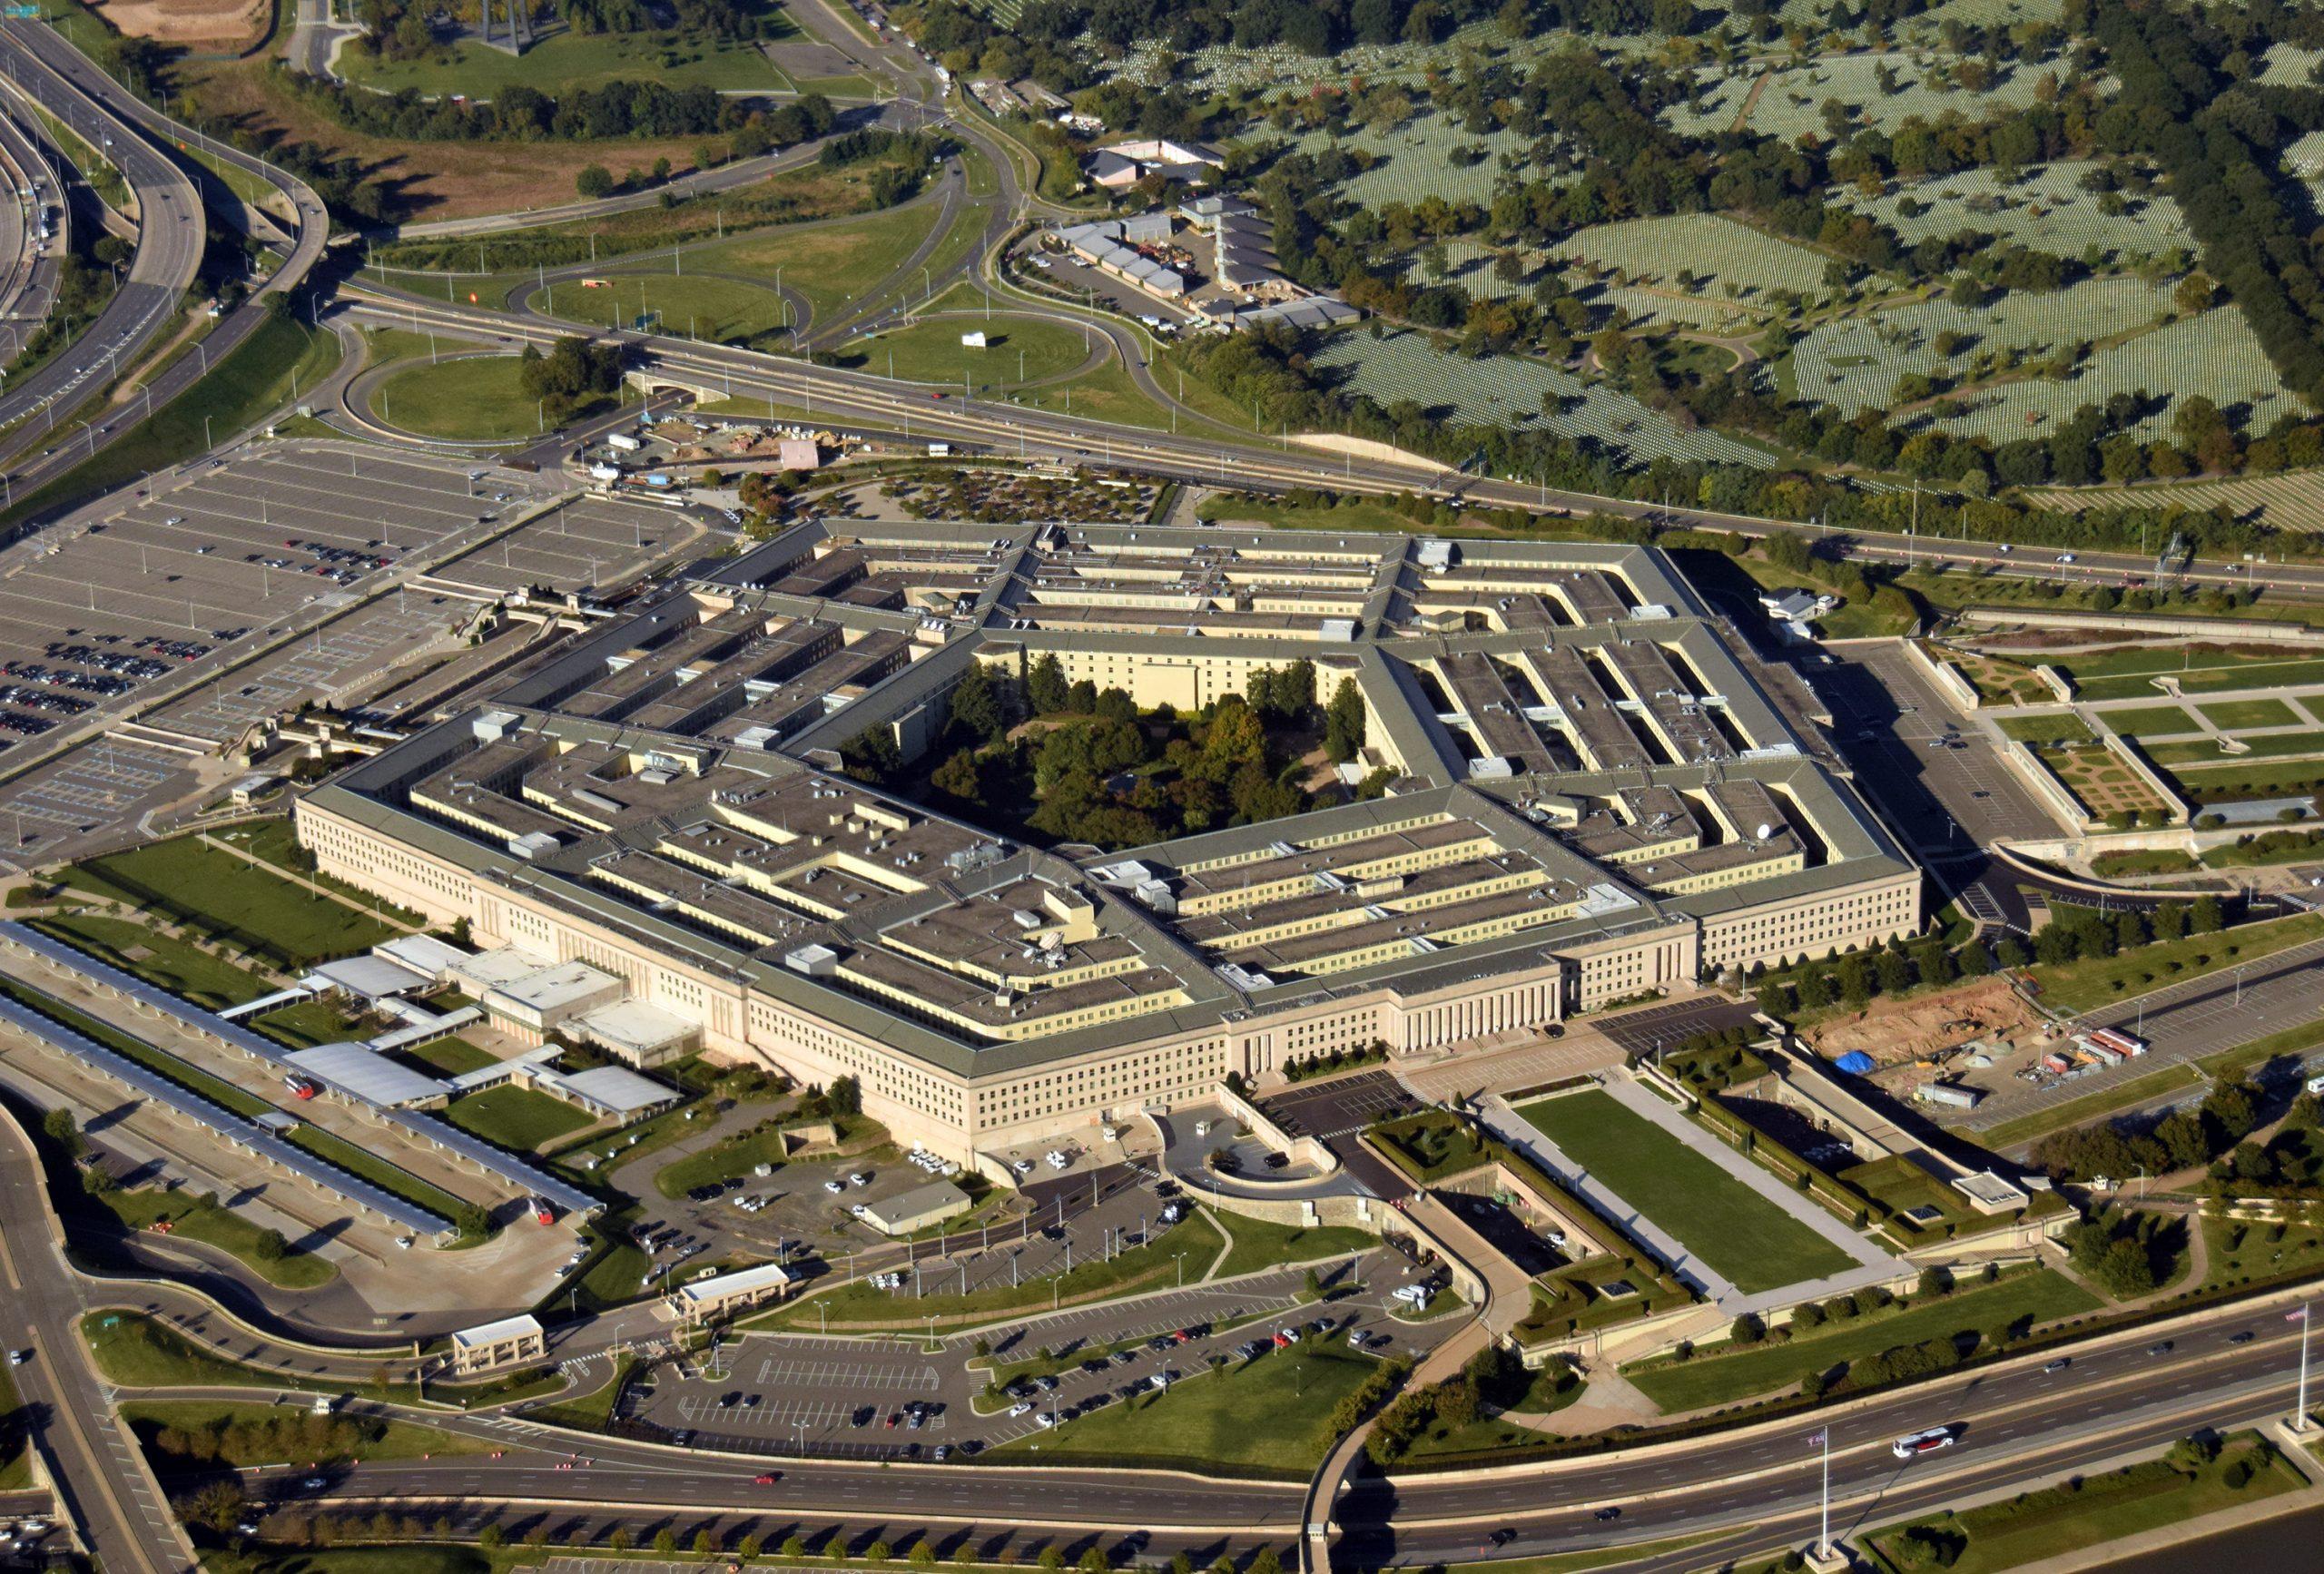 Pentagon gibt Gründung von offizieller UFO-Arbeitsgruppe bekannt